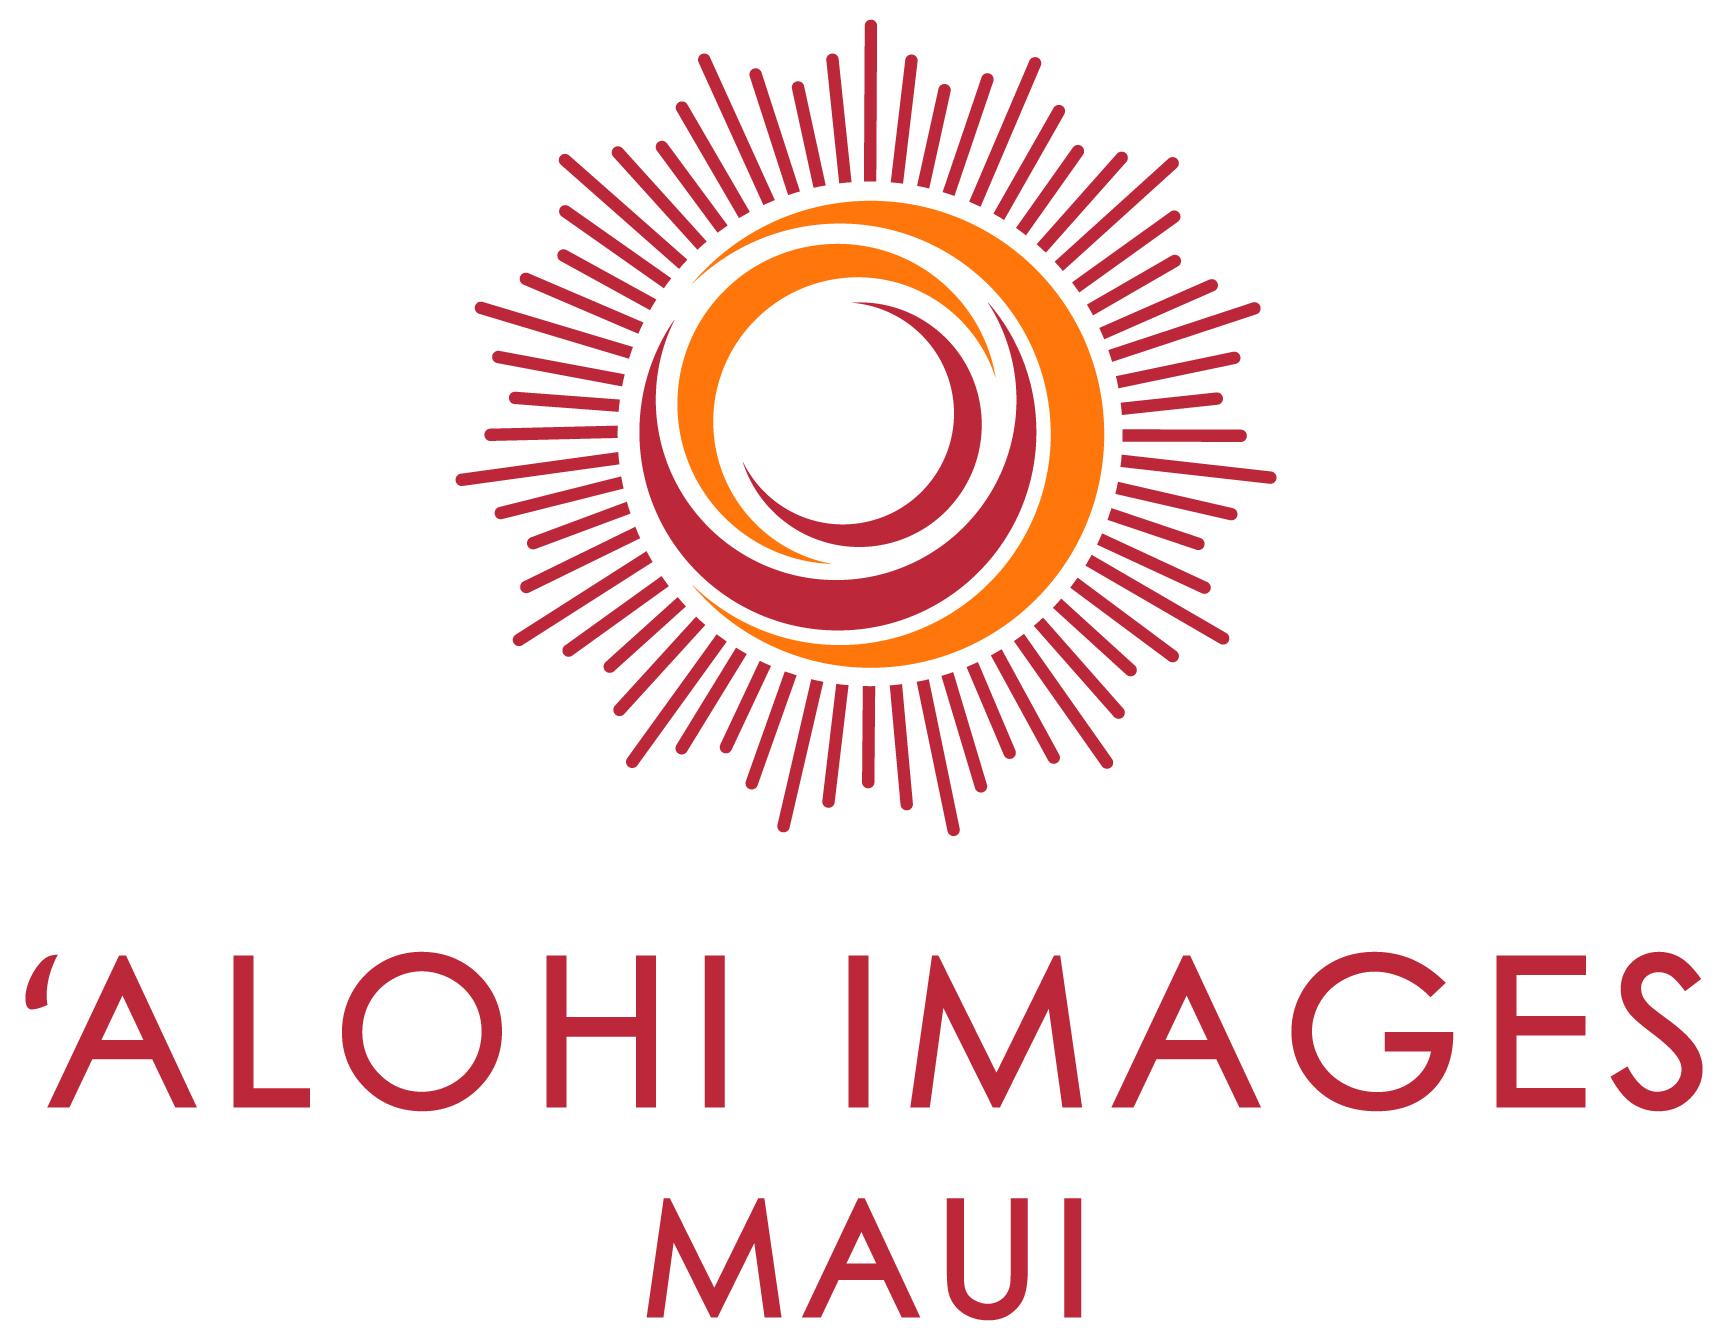 ALOHI_IMAGES_LOGO_LR.jpg